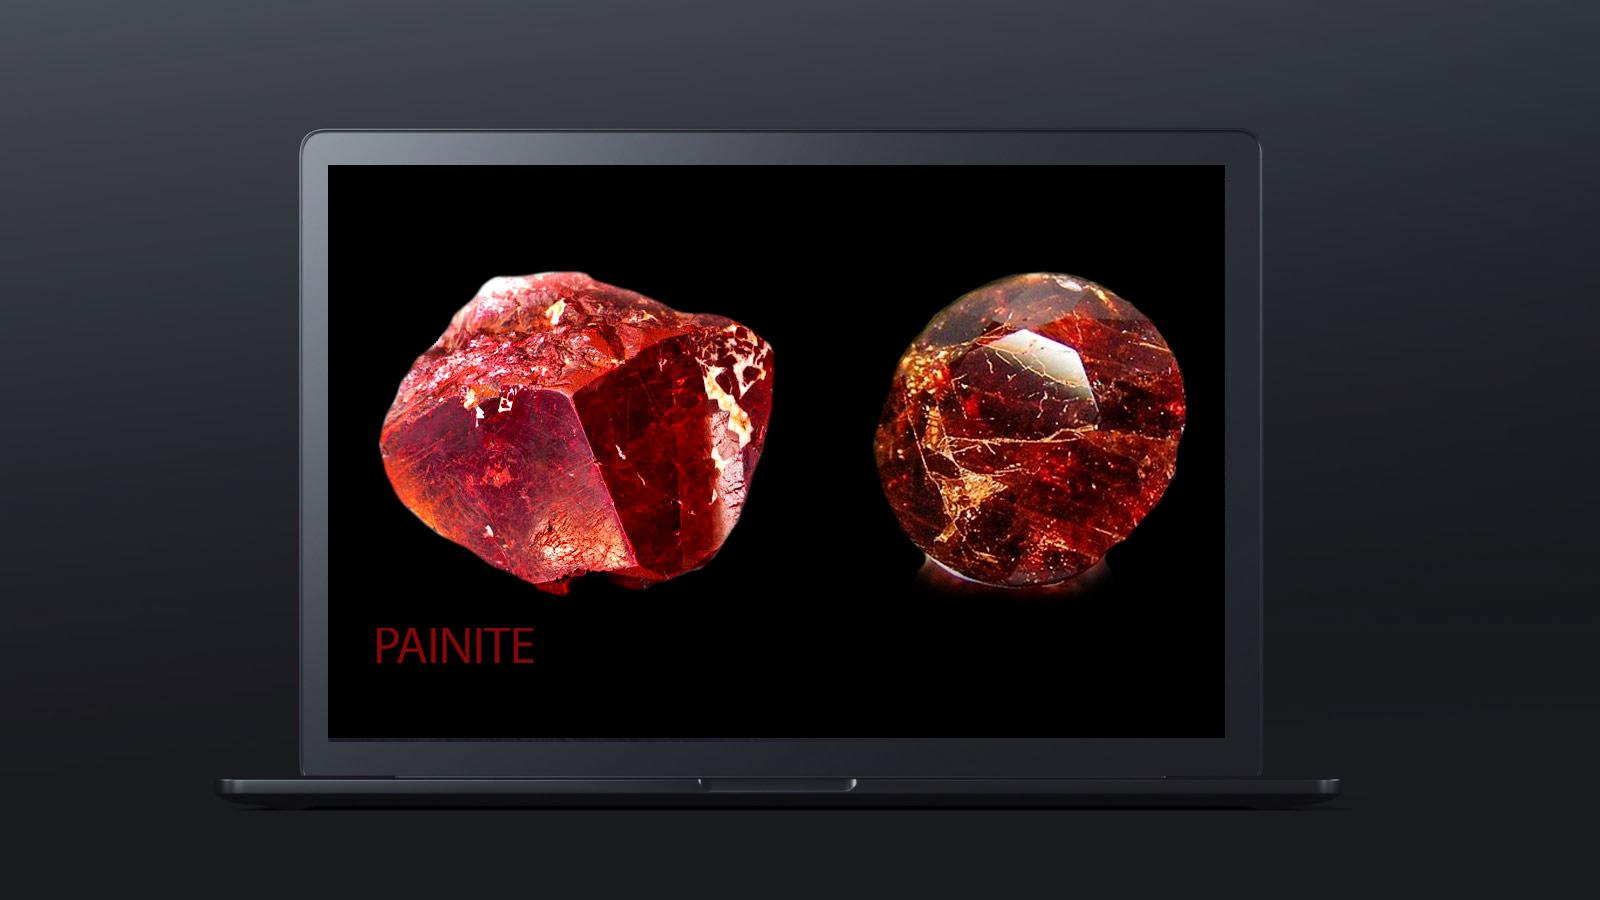 10 worlds rarest gemstones PAINITE 2 - ده گوهر کمیاب دنیا کدامند؟